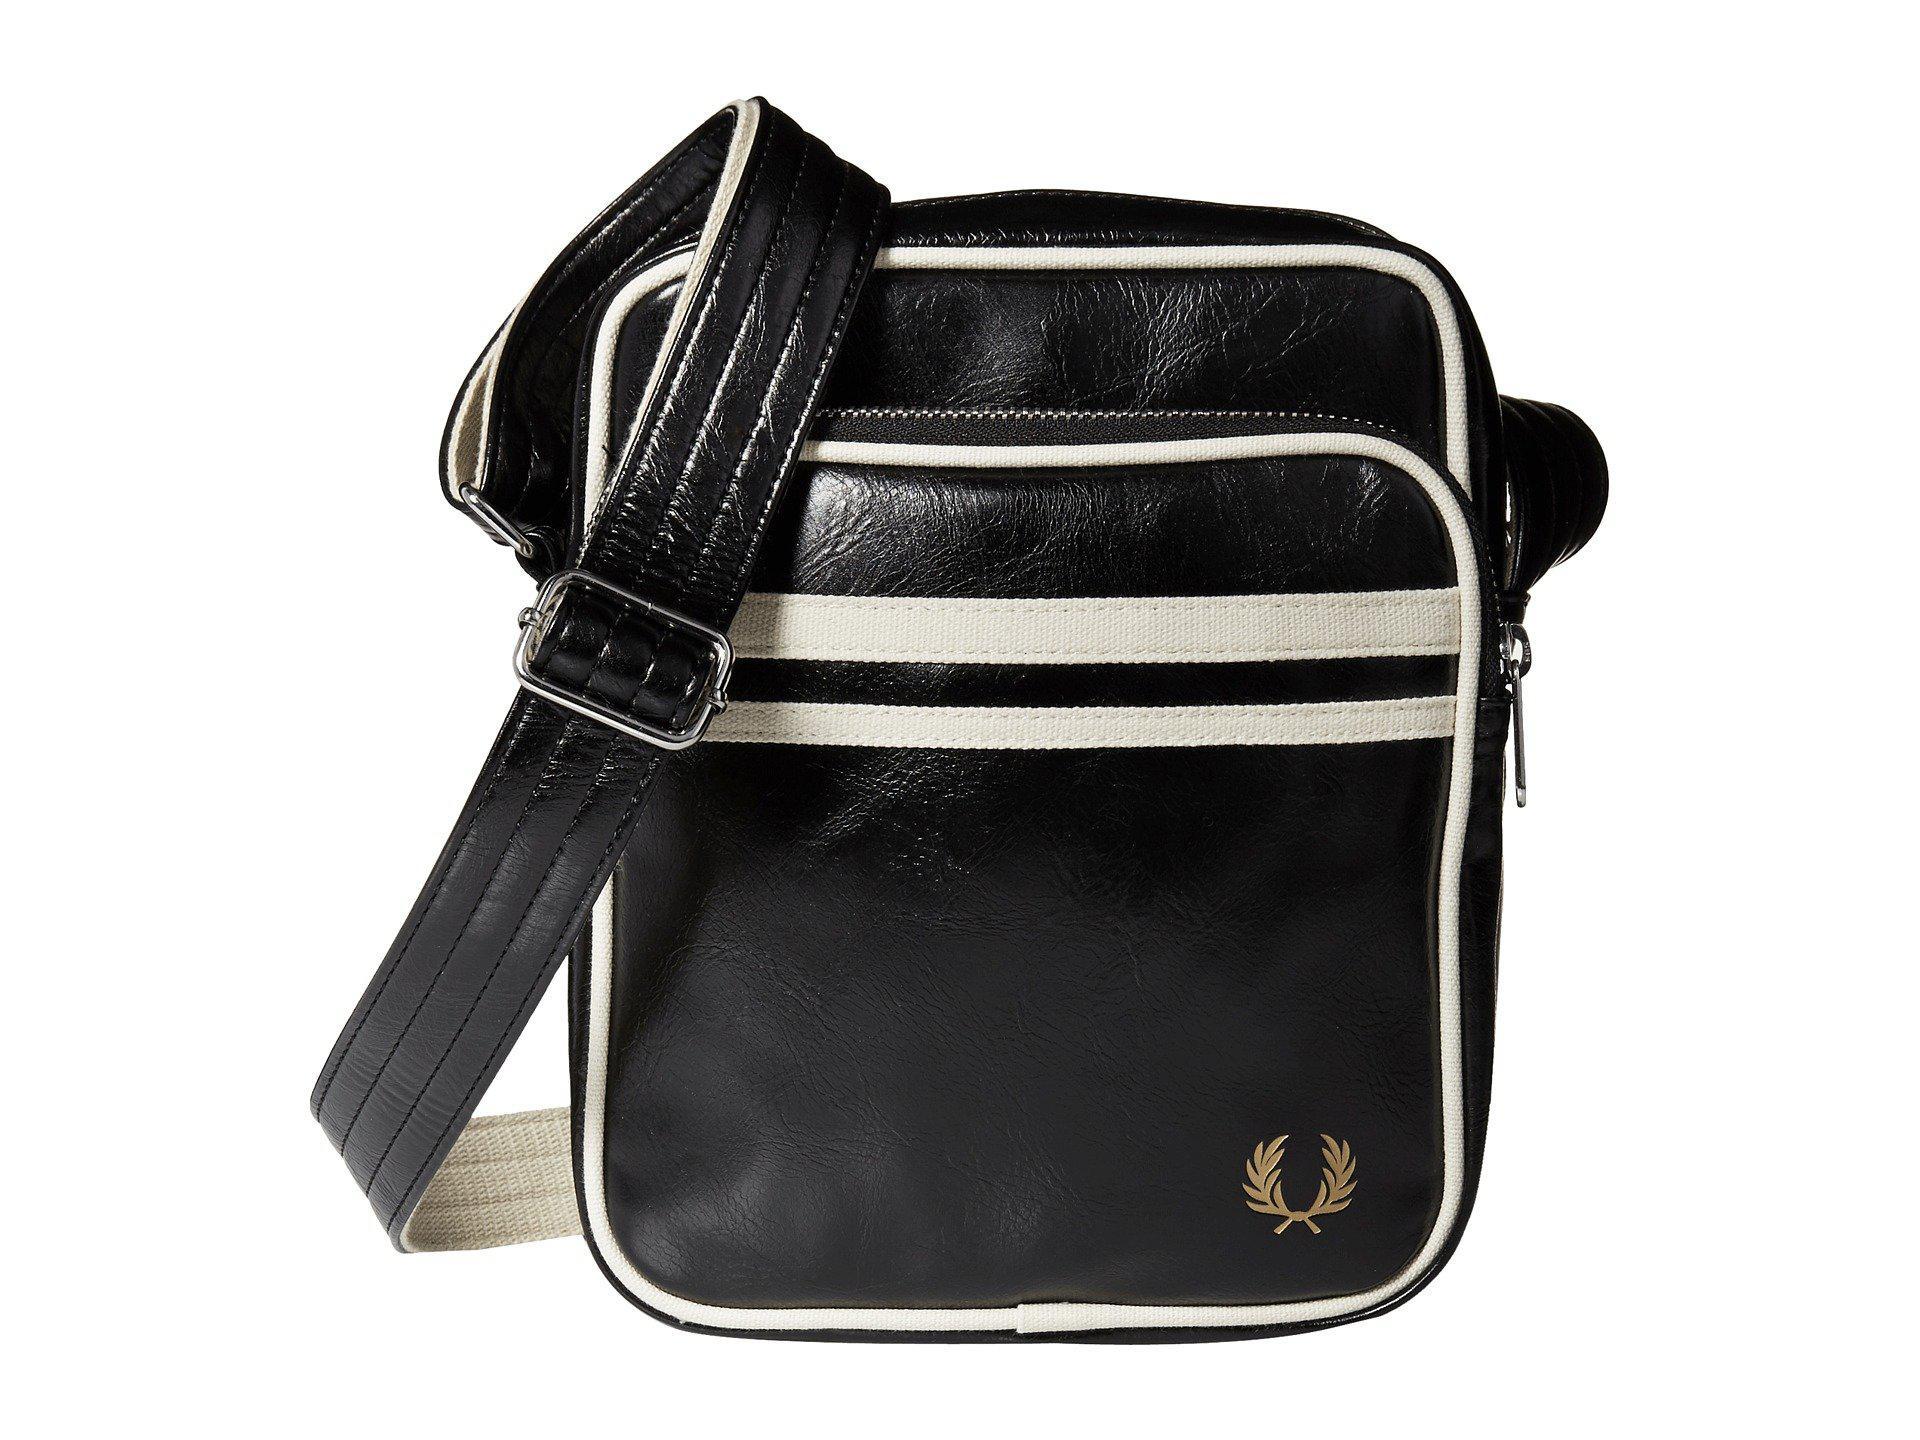 445cc7226245 Lyst - Fred Perry Twin Tipped Crossbody Bag (black ecru) Bags in ...